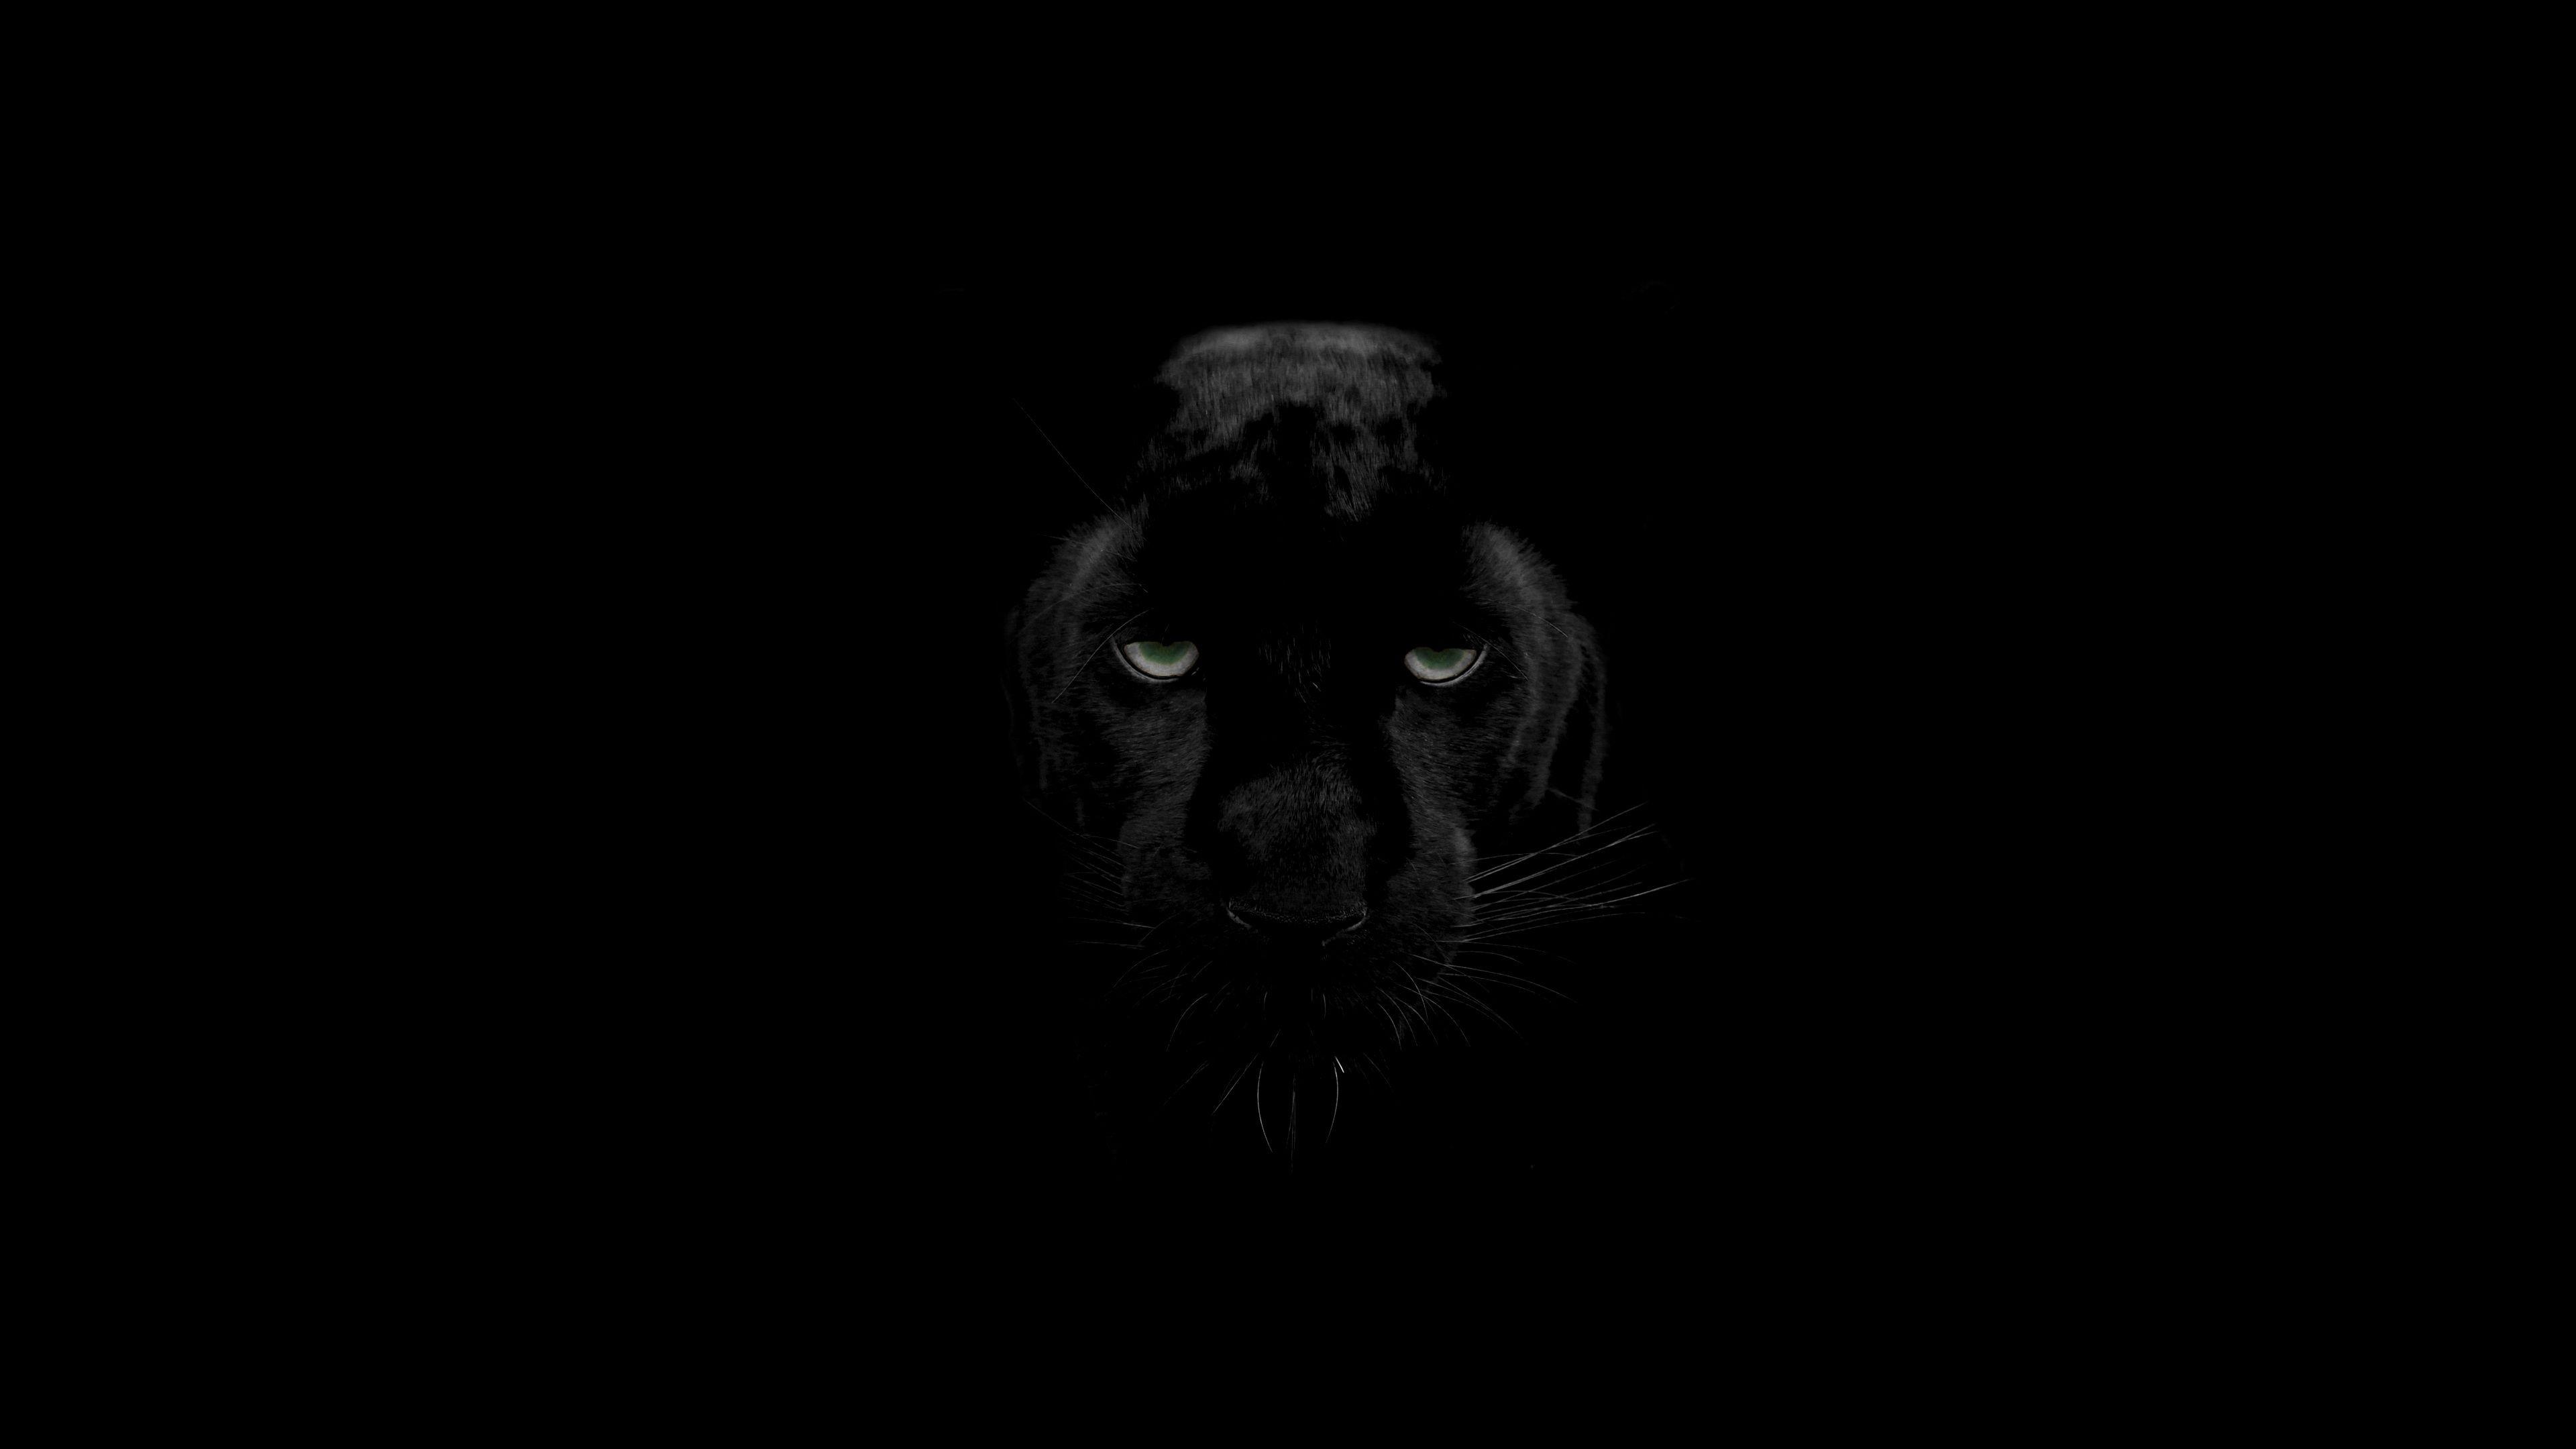 Black Panther 4K Panther, Black panther, Black desktop